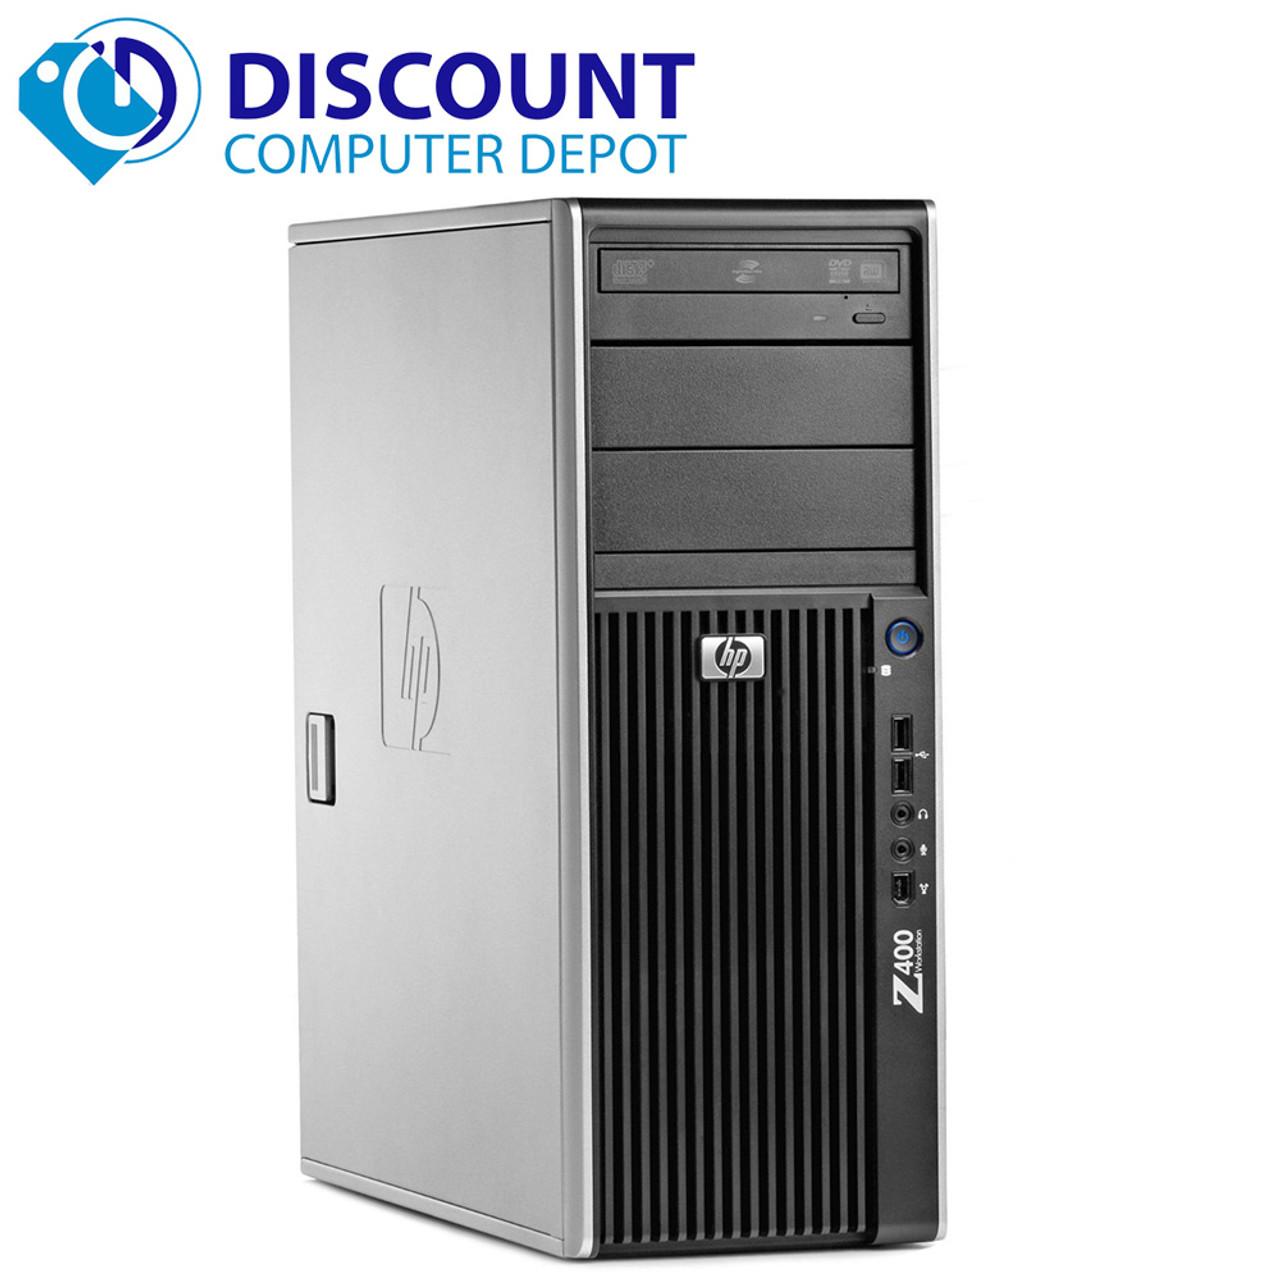 HP Z420 Workstation Desktop Computer PC Intel Xeon 2 8GHZ 8GB 1TB Win10 Pro  and WIFI